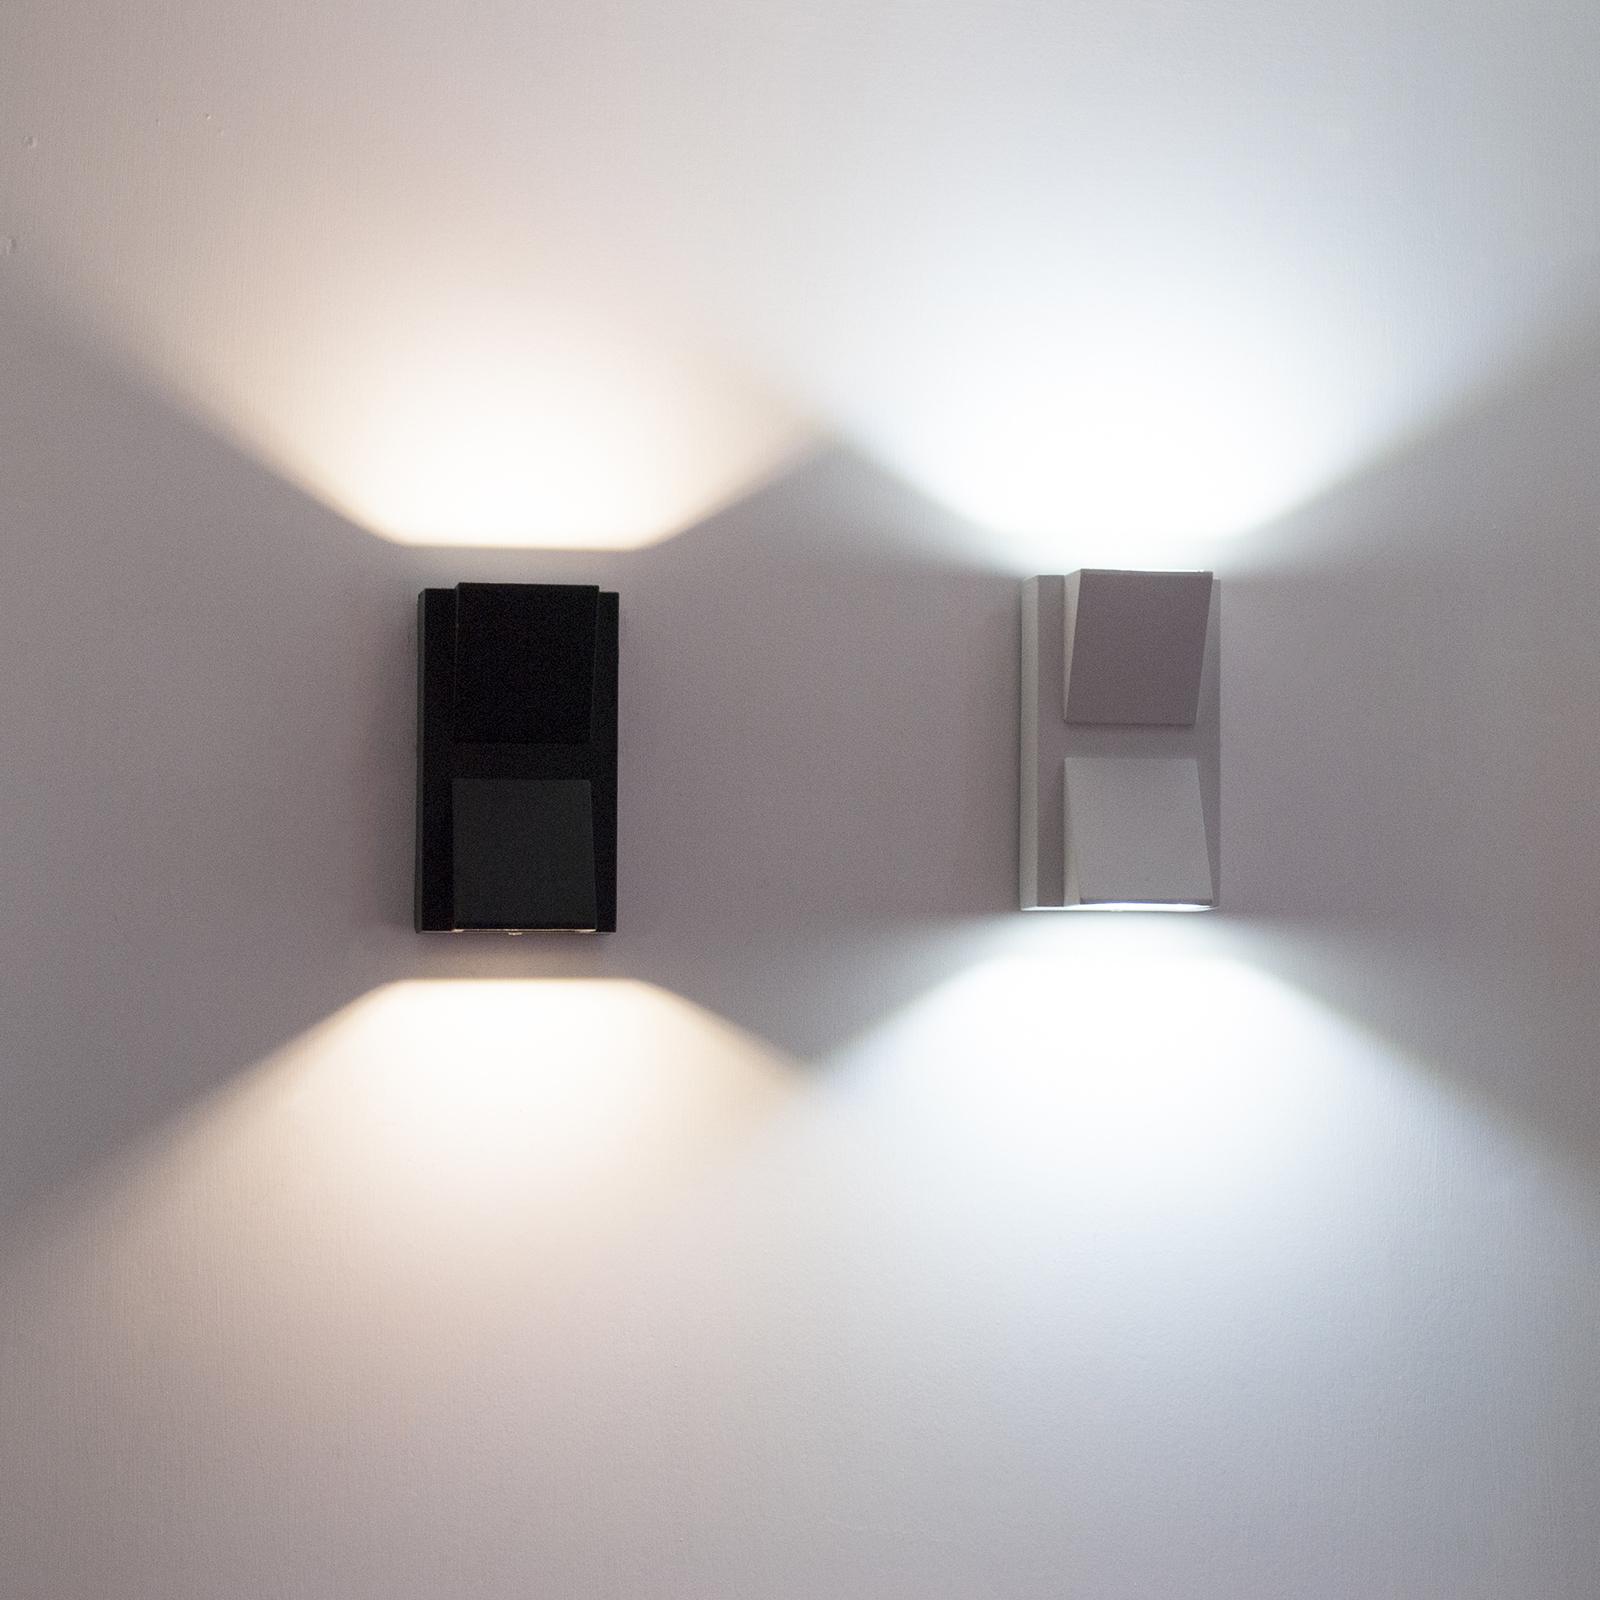 Moderna Lampada Esterno Lampada da parete muro lampada da soffitto luce lampada